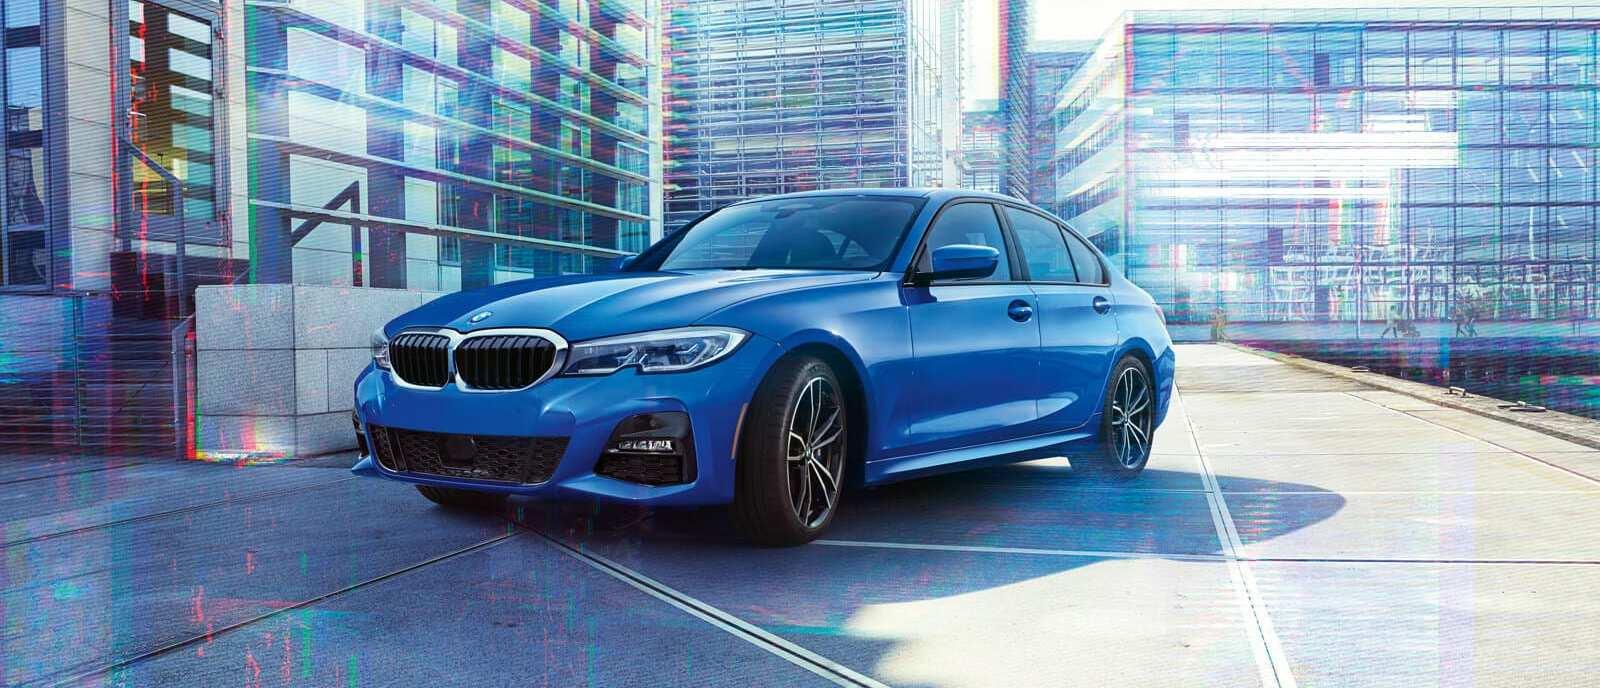 2020 BMW 3 Series Leasing near Texarkana, TX